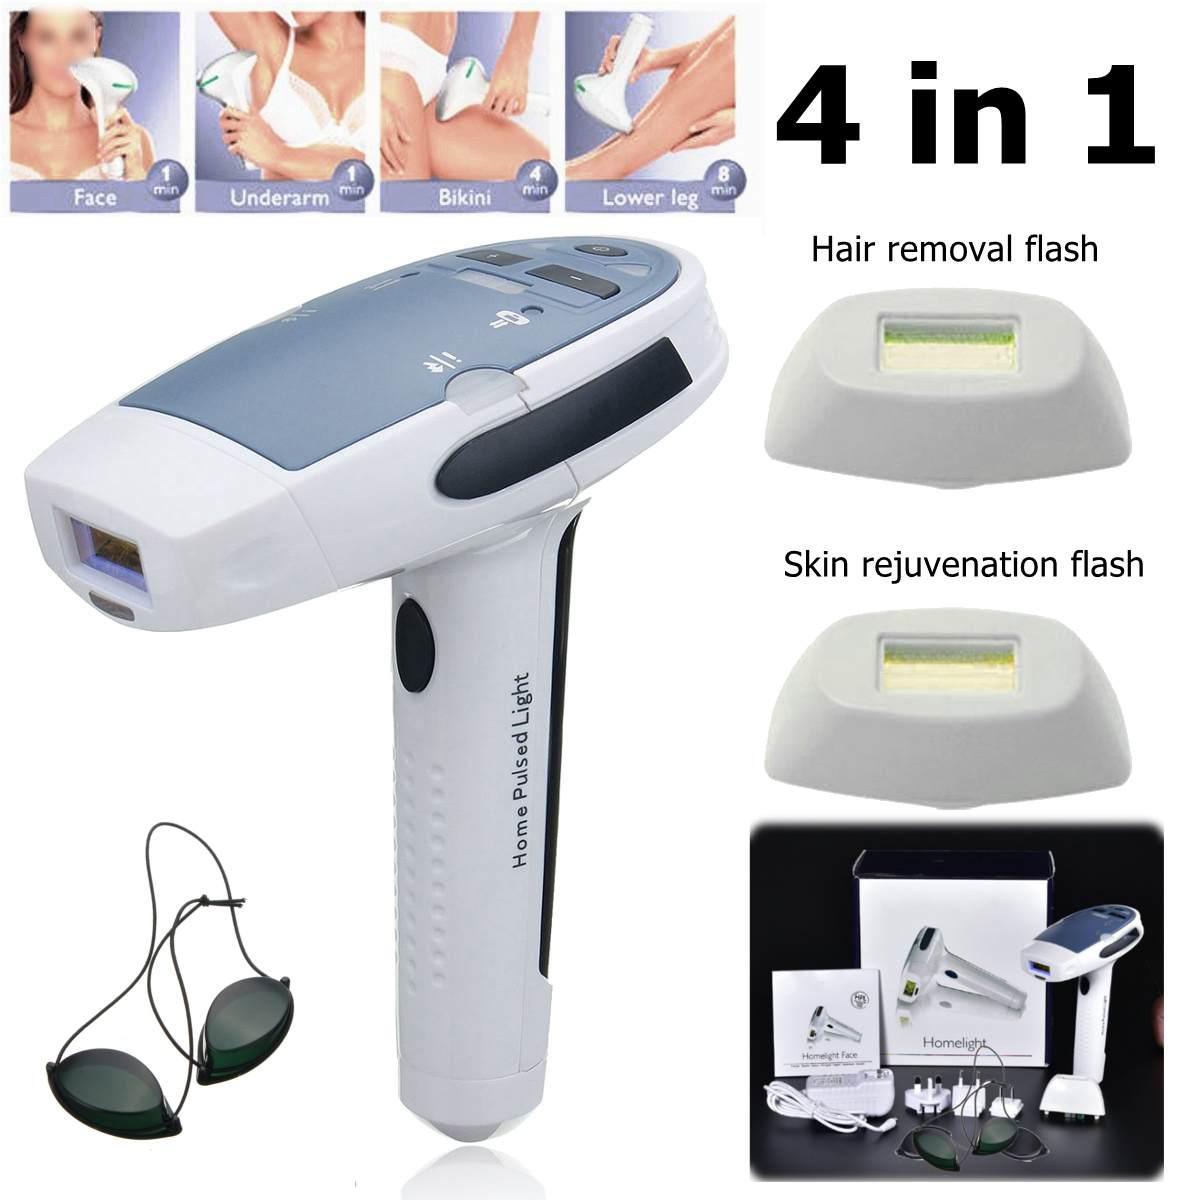 4 in1 Lobemoky 400000 Laser Permanent Hair Removal Machine Body Painless Epilator4 in1 Lobemoky 400000 Laser Permanent Hair Removal Machine Body Painless Epilator